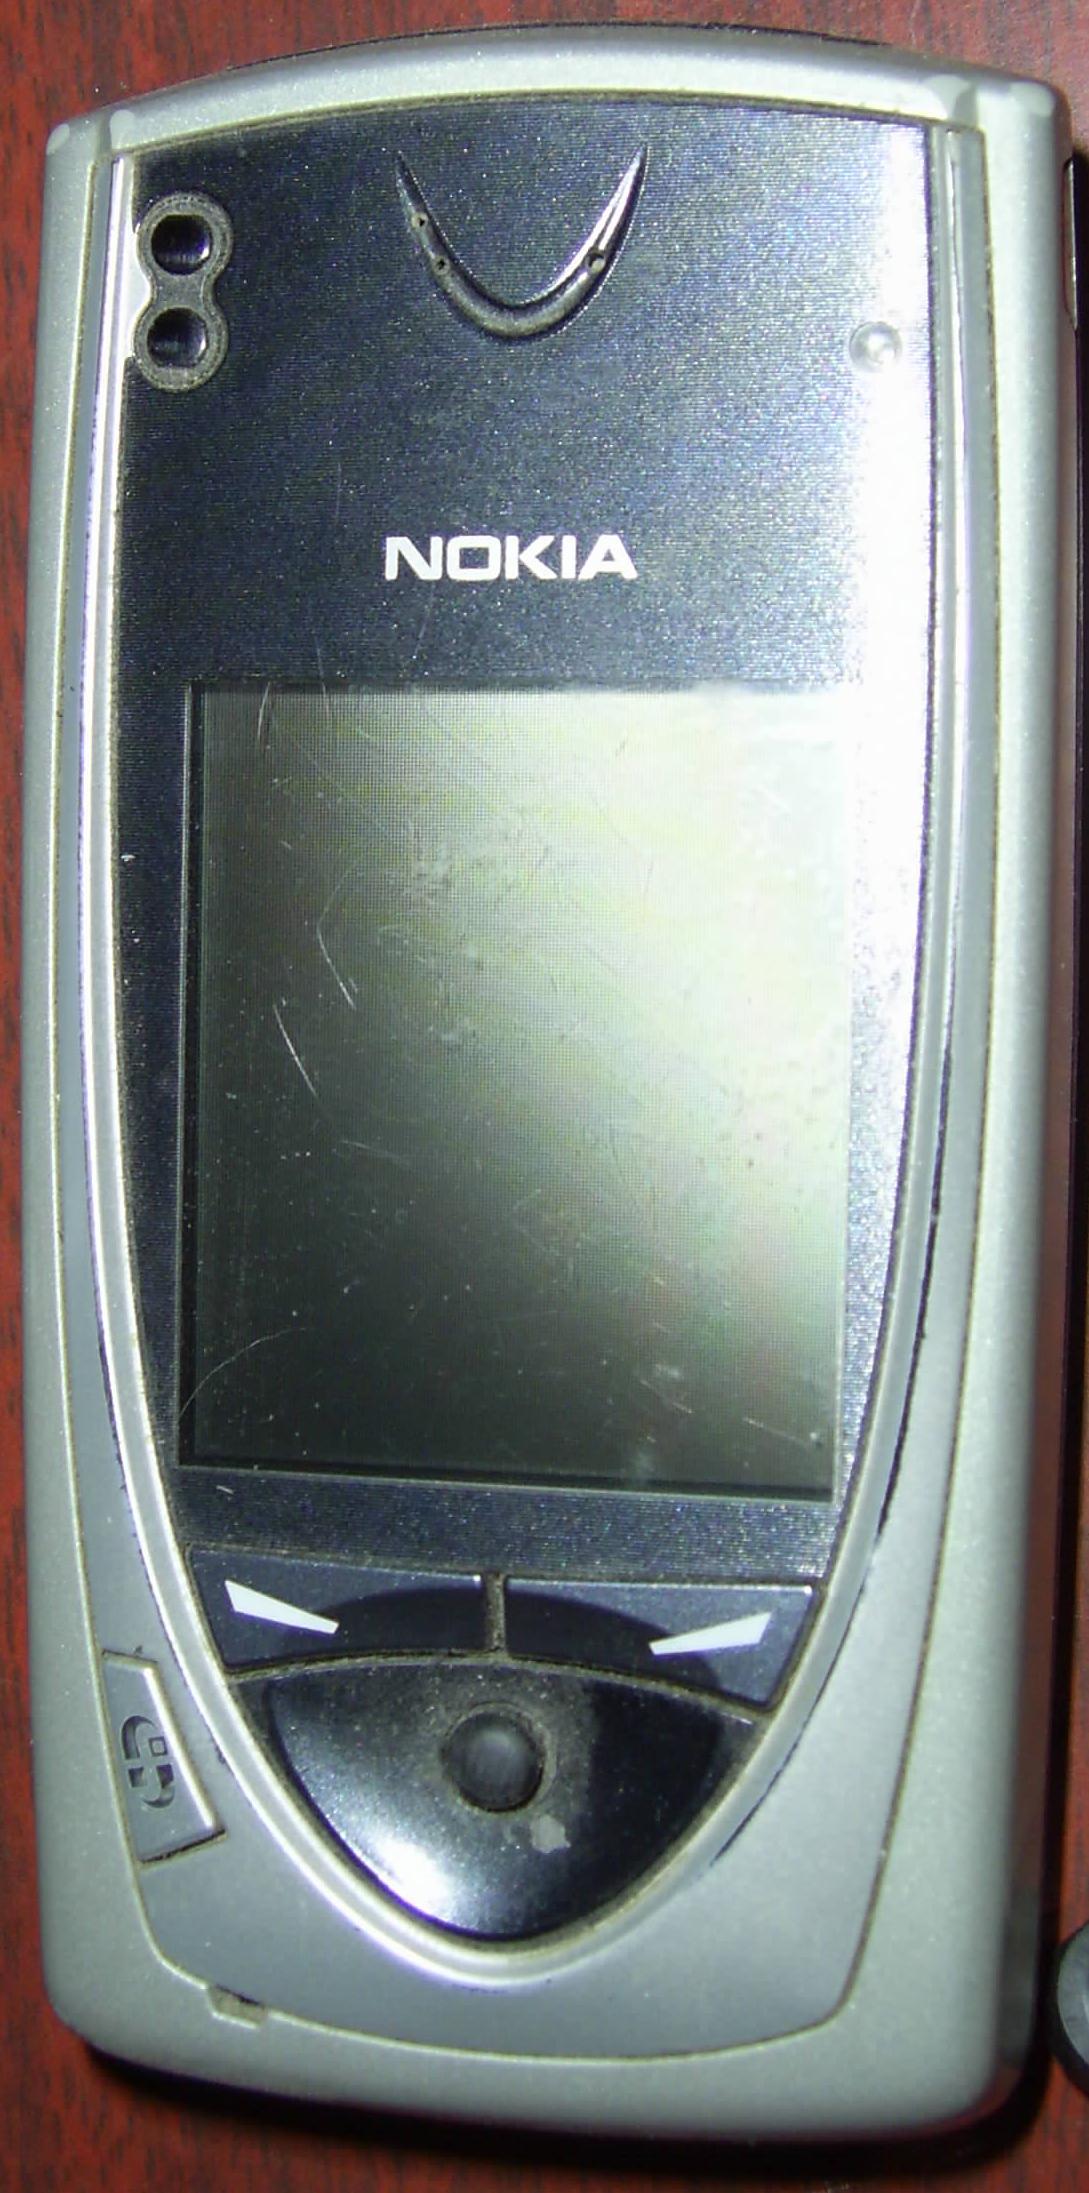 Nokia_7650_02.jpg